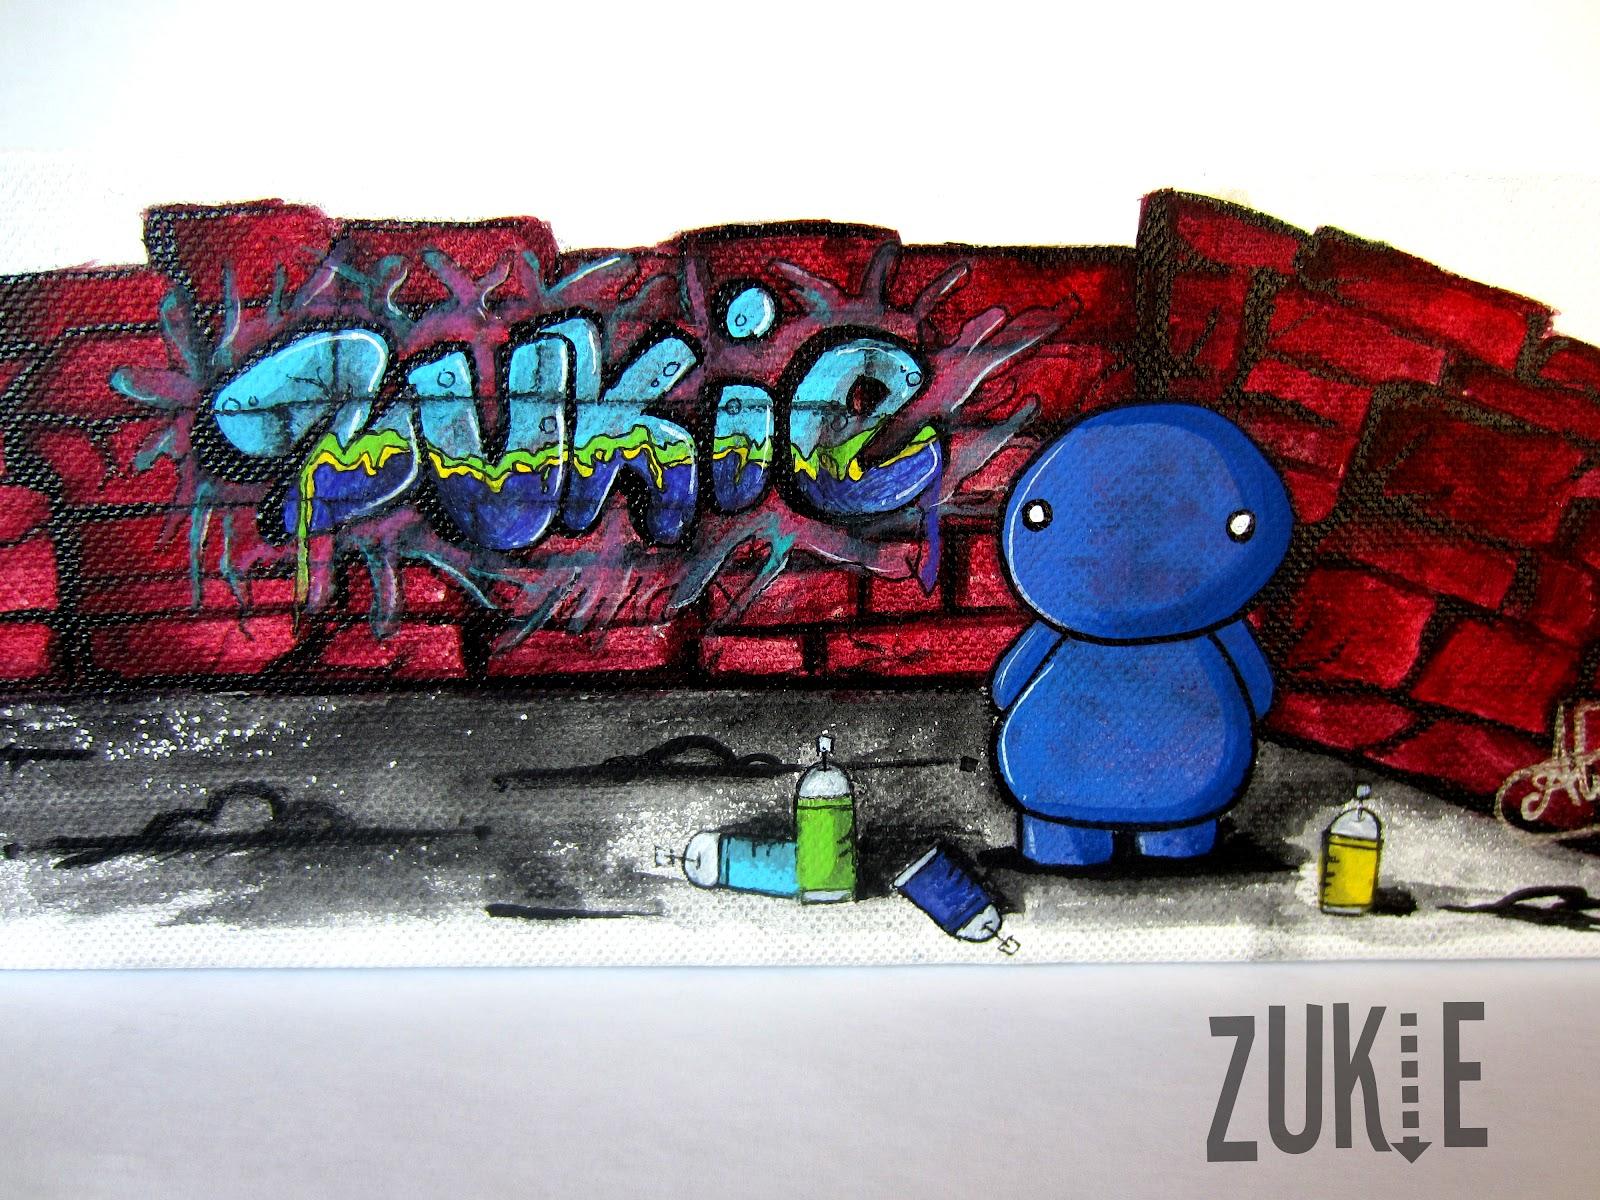 Zukie ART: The Frist Zukie Tagger on Canvas!!!